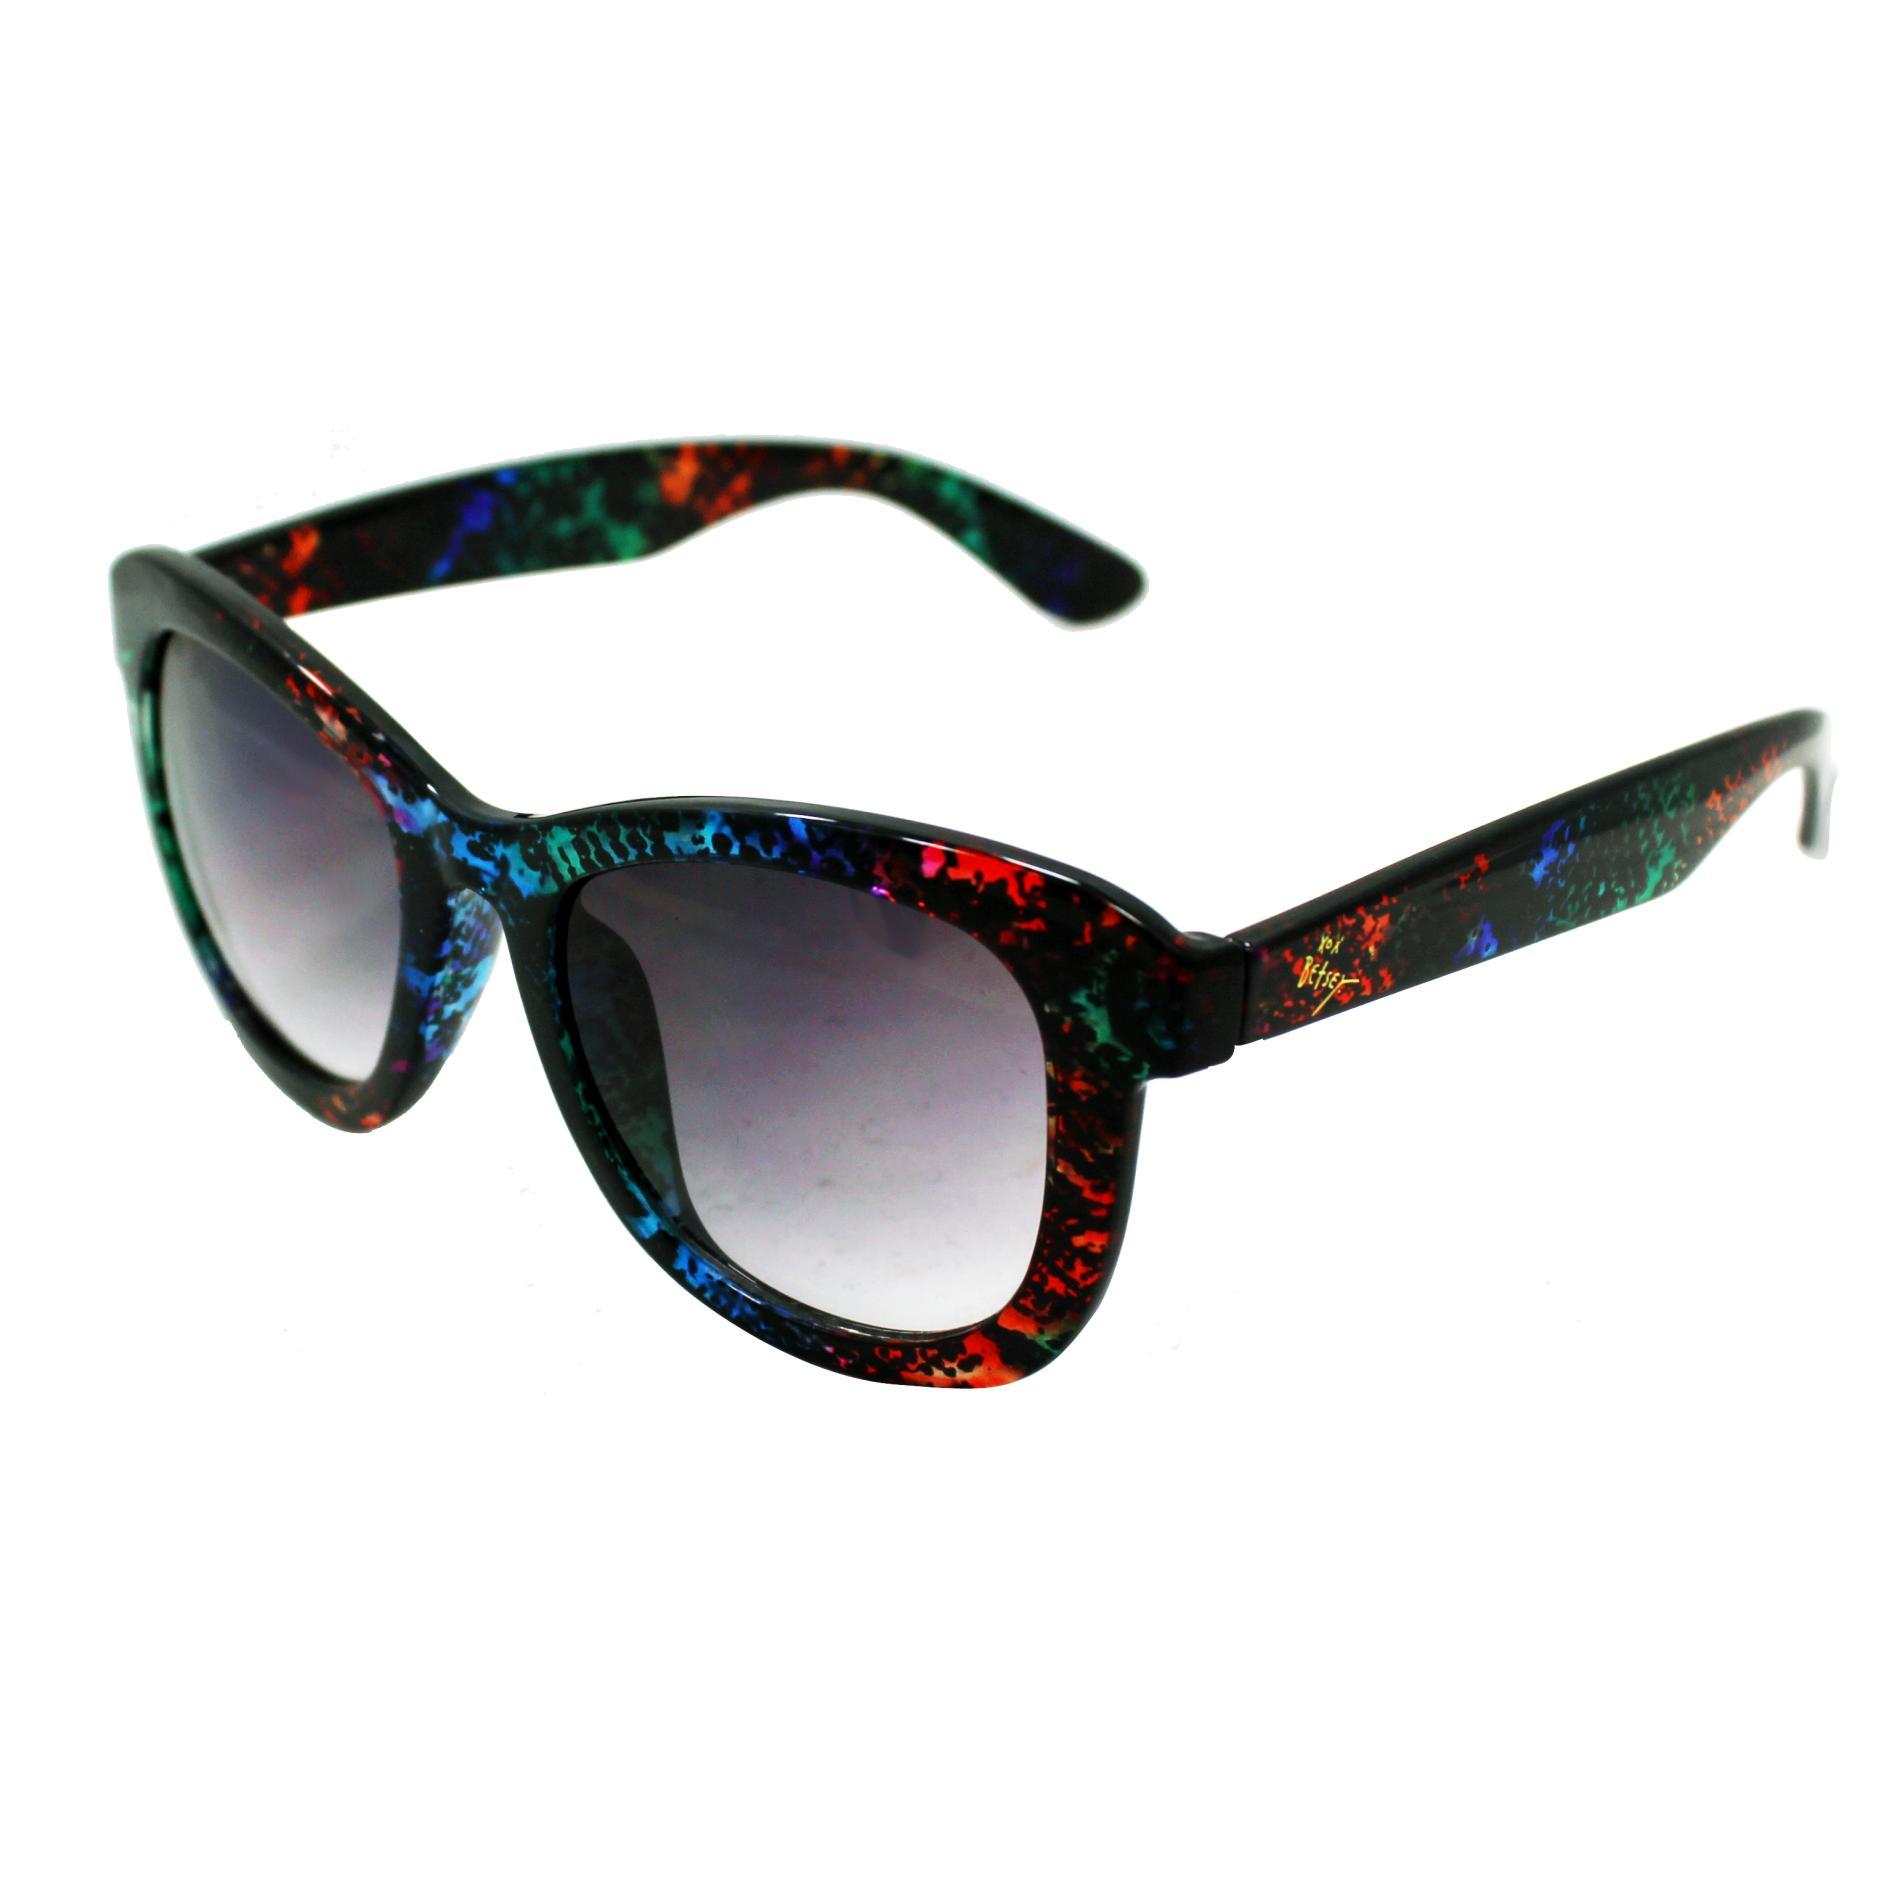 Betsyville Women's Large Retro Sunglasses - Rainbow